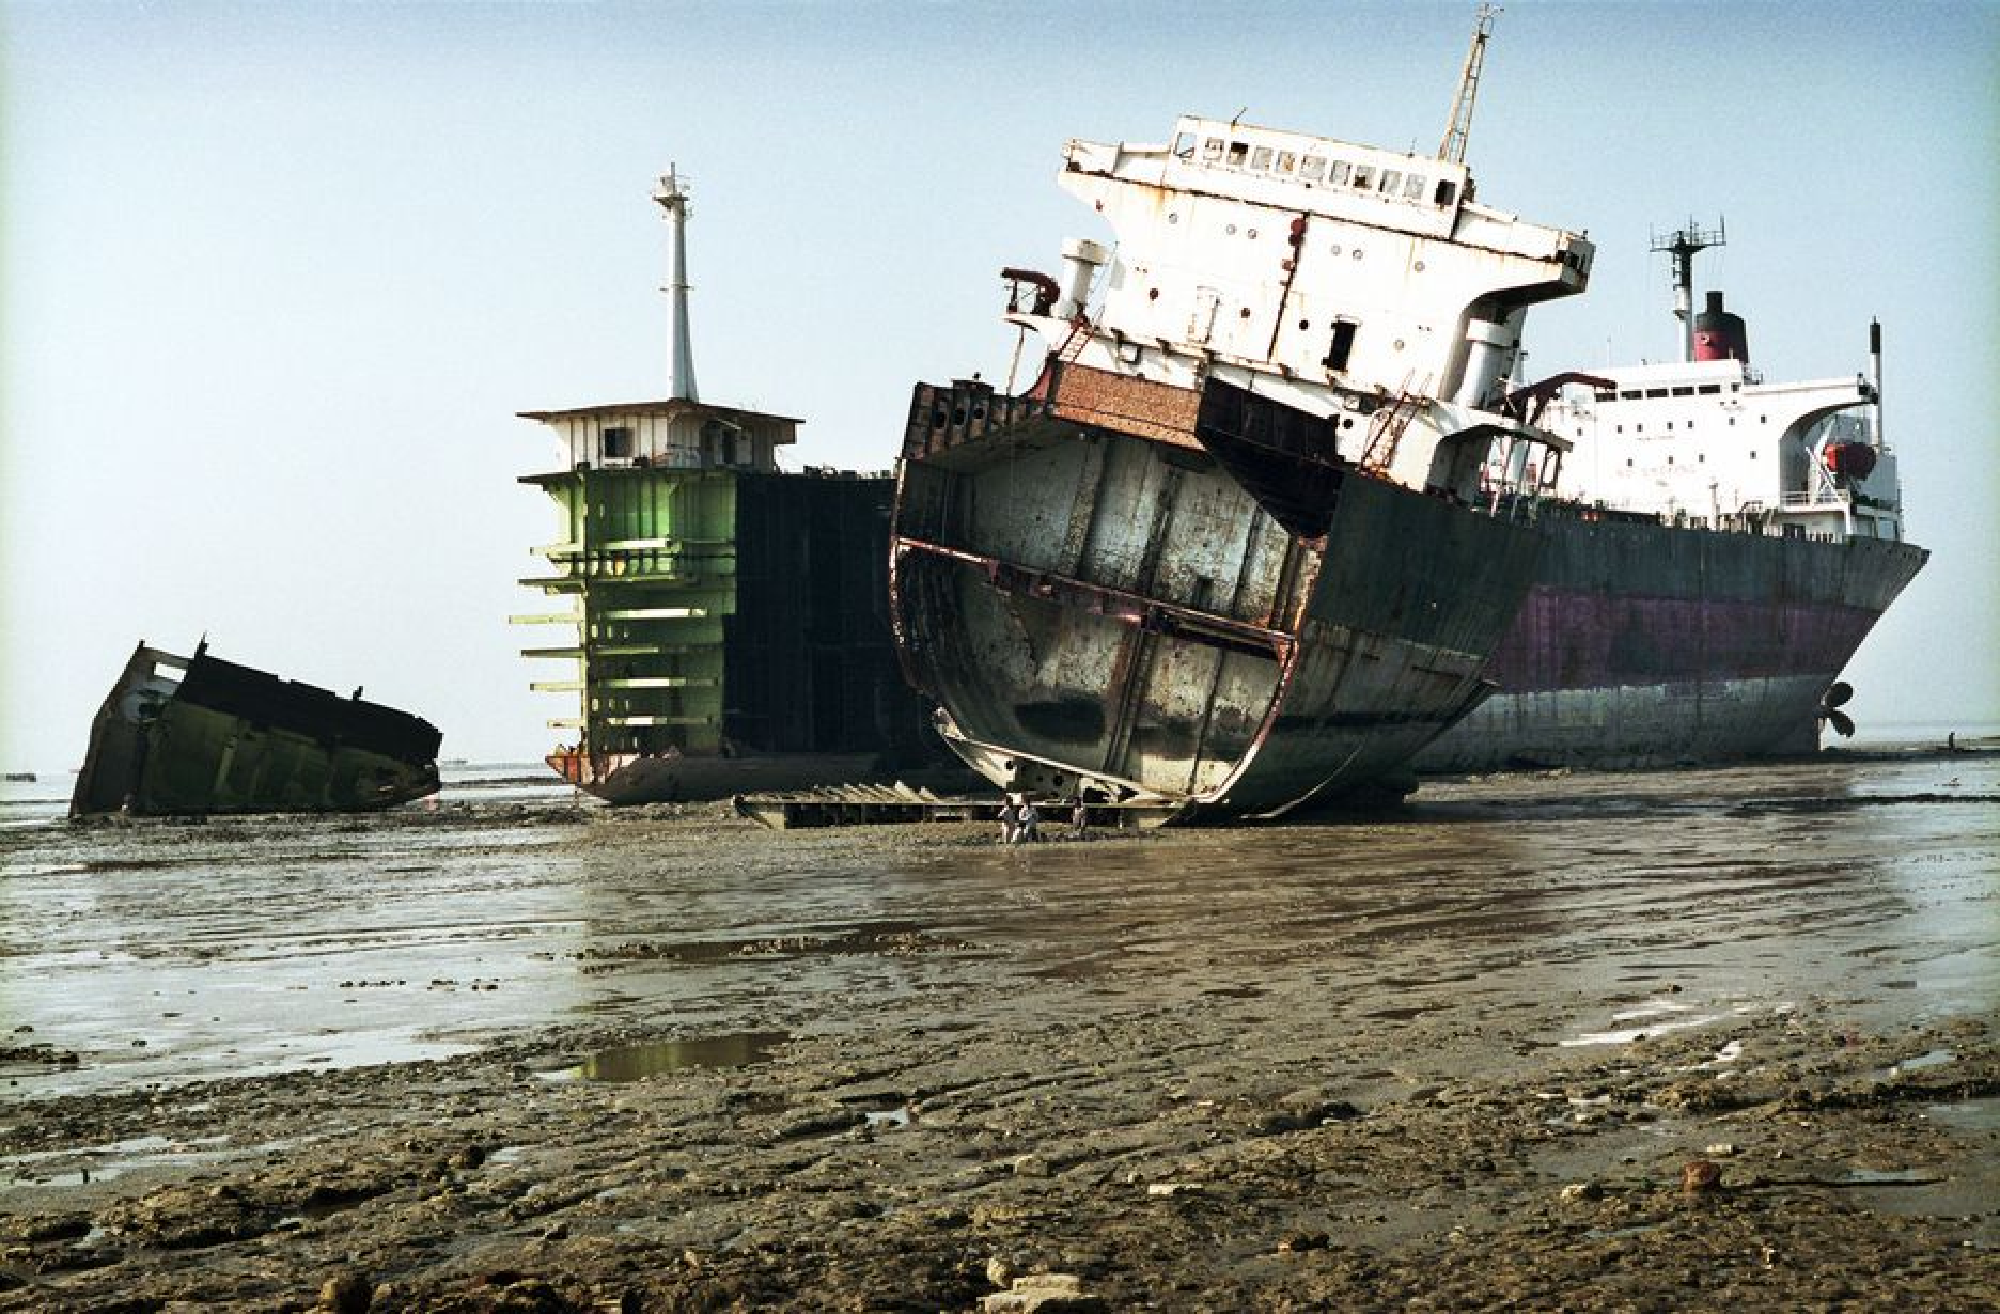 Skipsopphugging, beaching, shipbreaking, opphugging, skip, IMO-konvensjon, forurensning, miljøfarlige stoffer